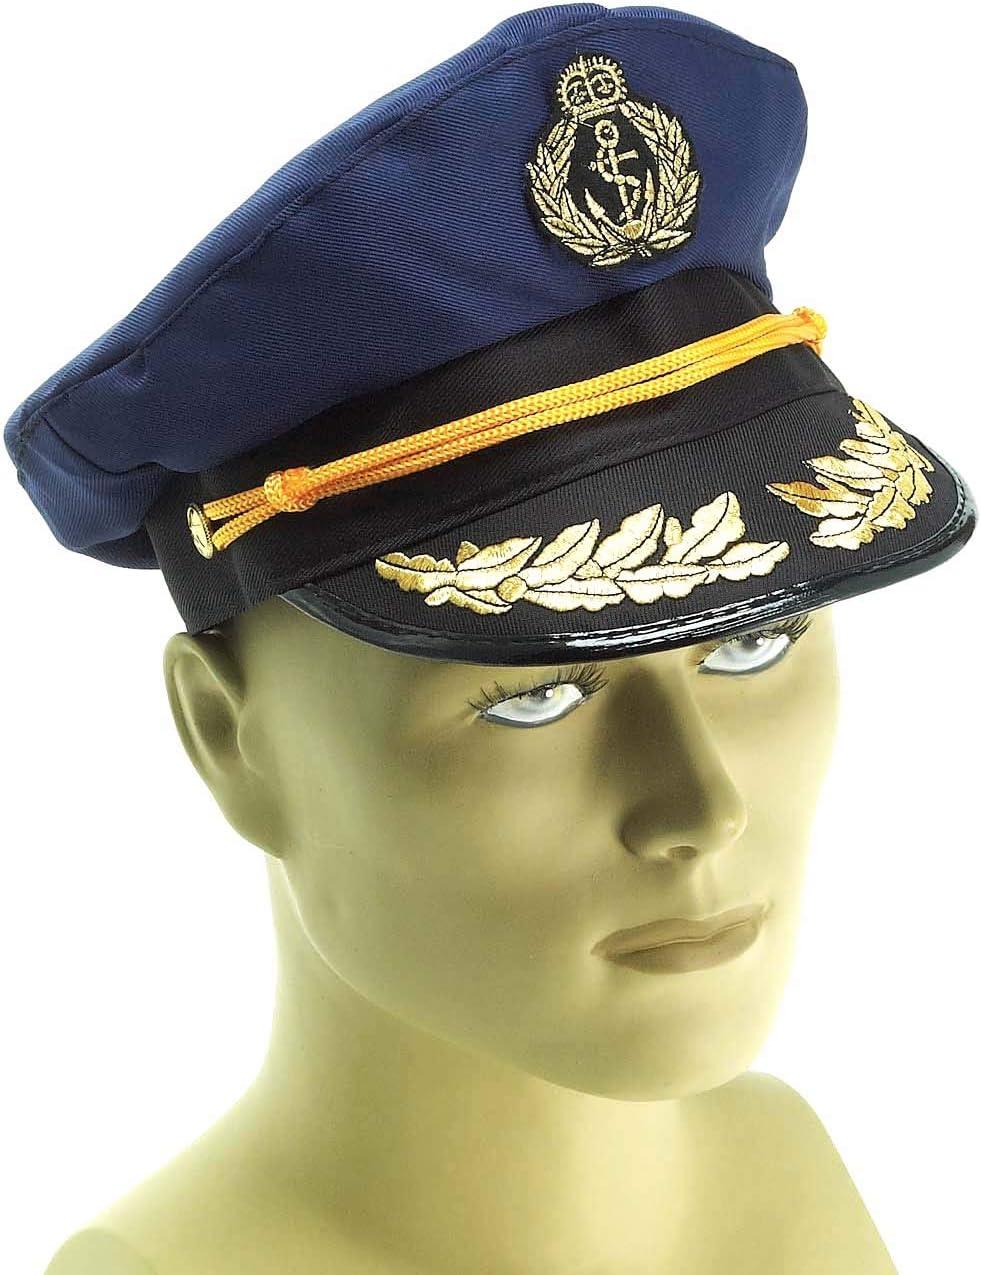 Forum Novelties Yacht Captains Hat for Adults, Navy Blue